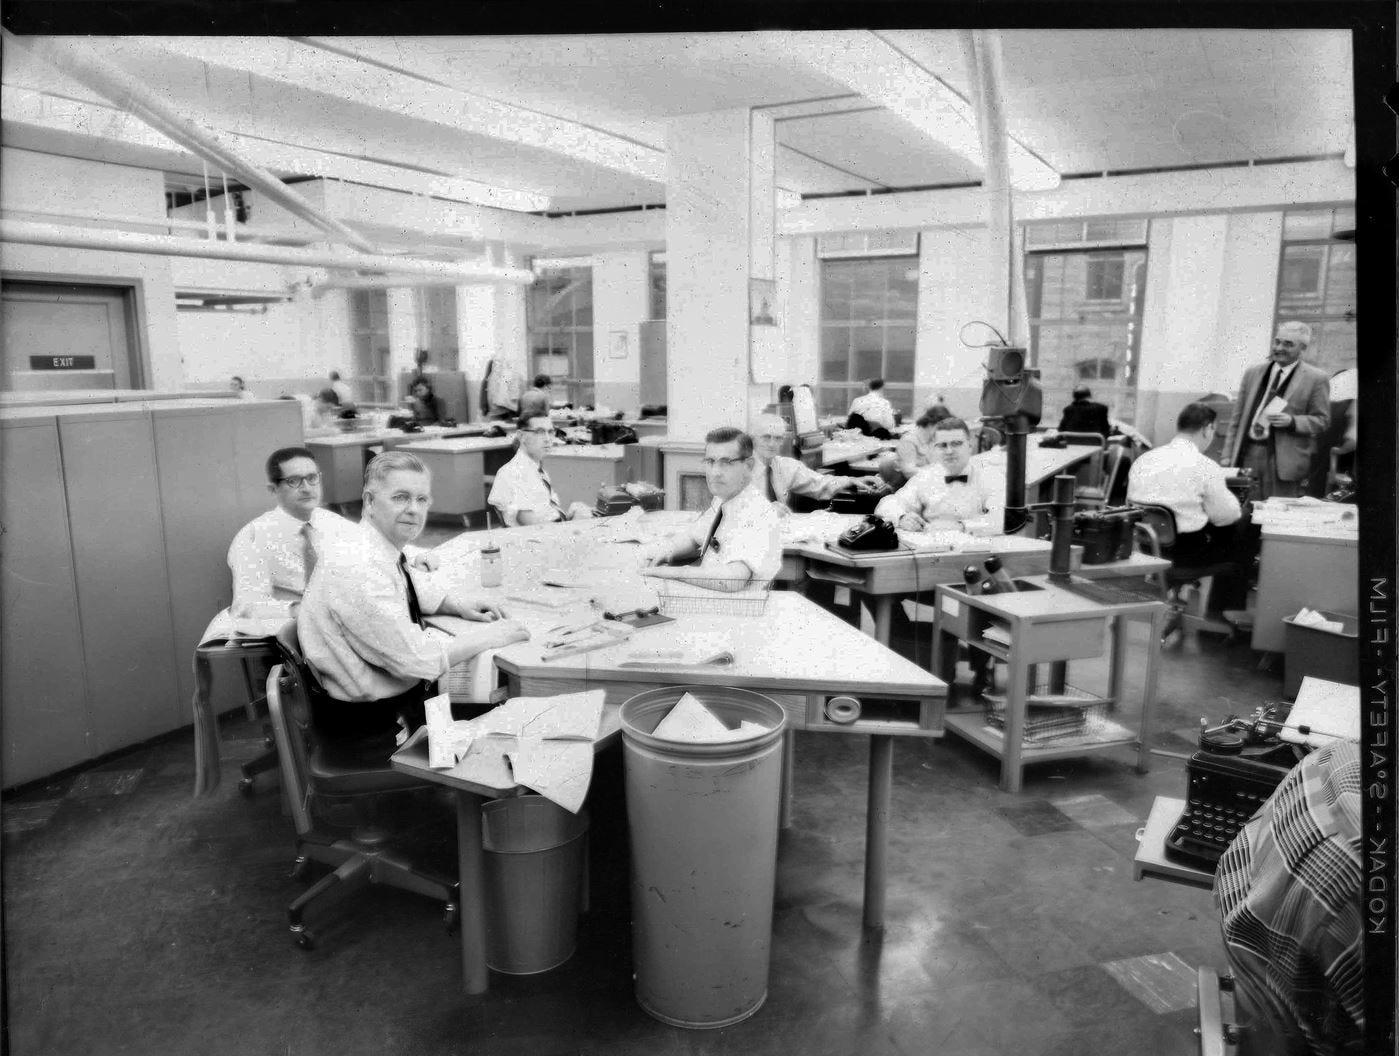 Knoxville News Sentinel Newsroom - Undated photo